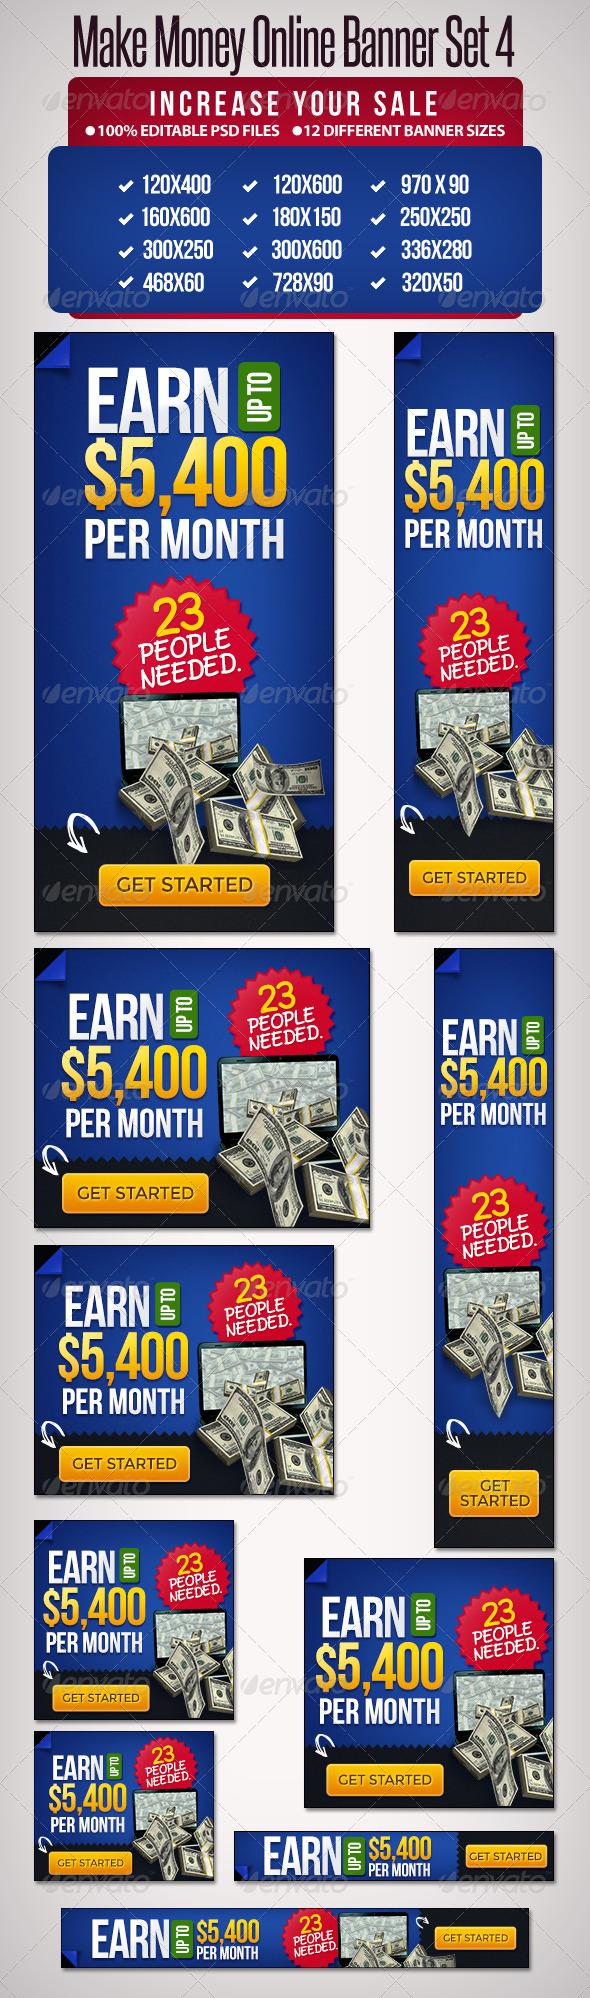 GraphicRiver Make Money Online Set 4 12 Google Sizes 5284805